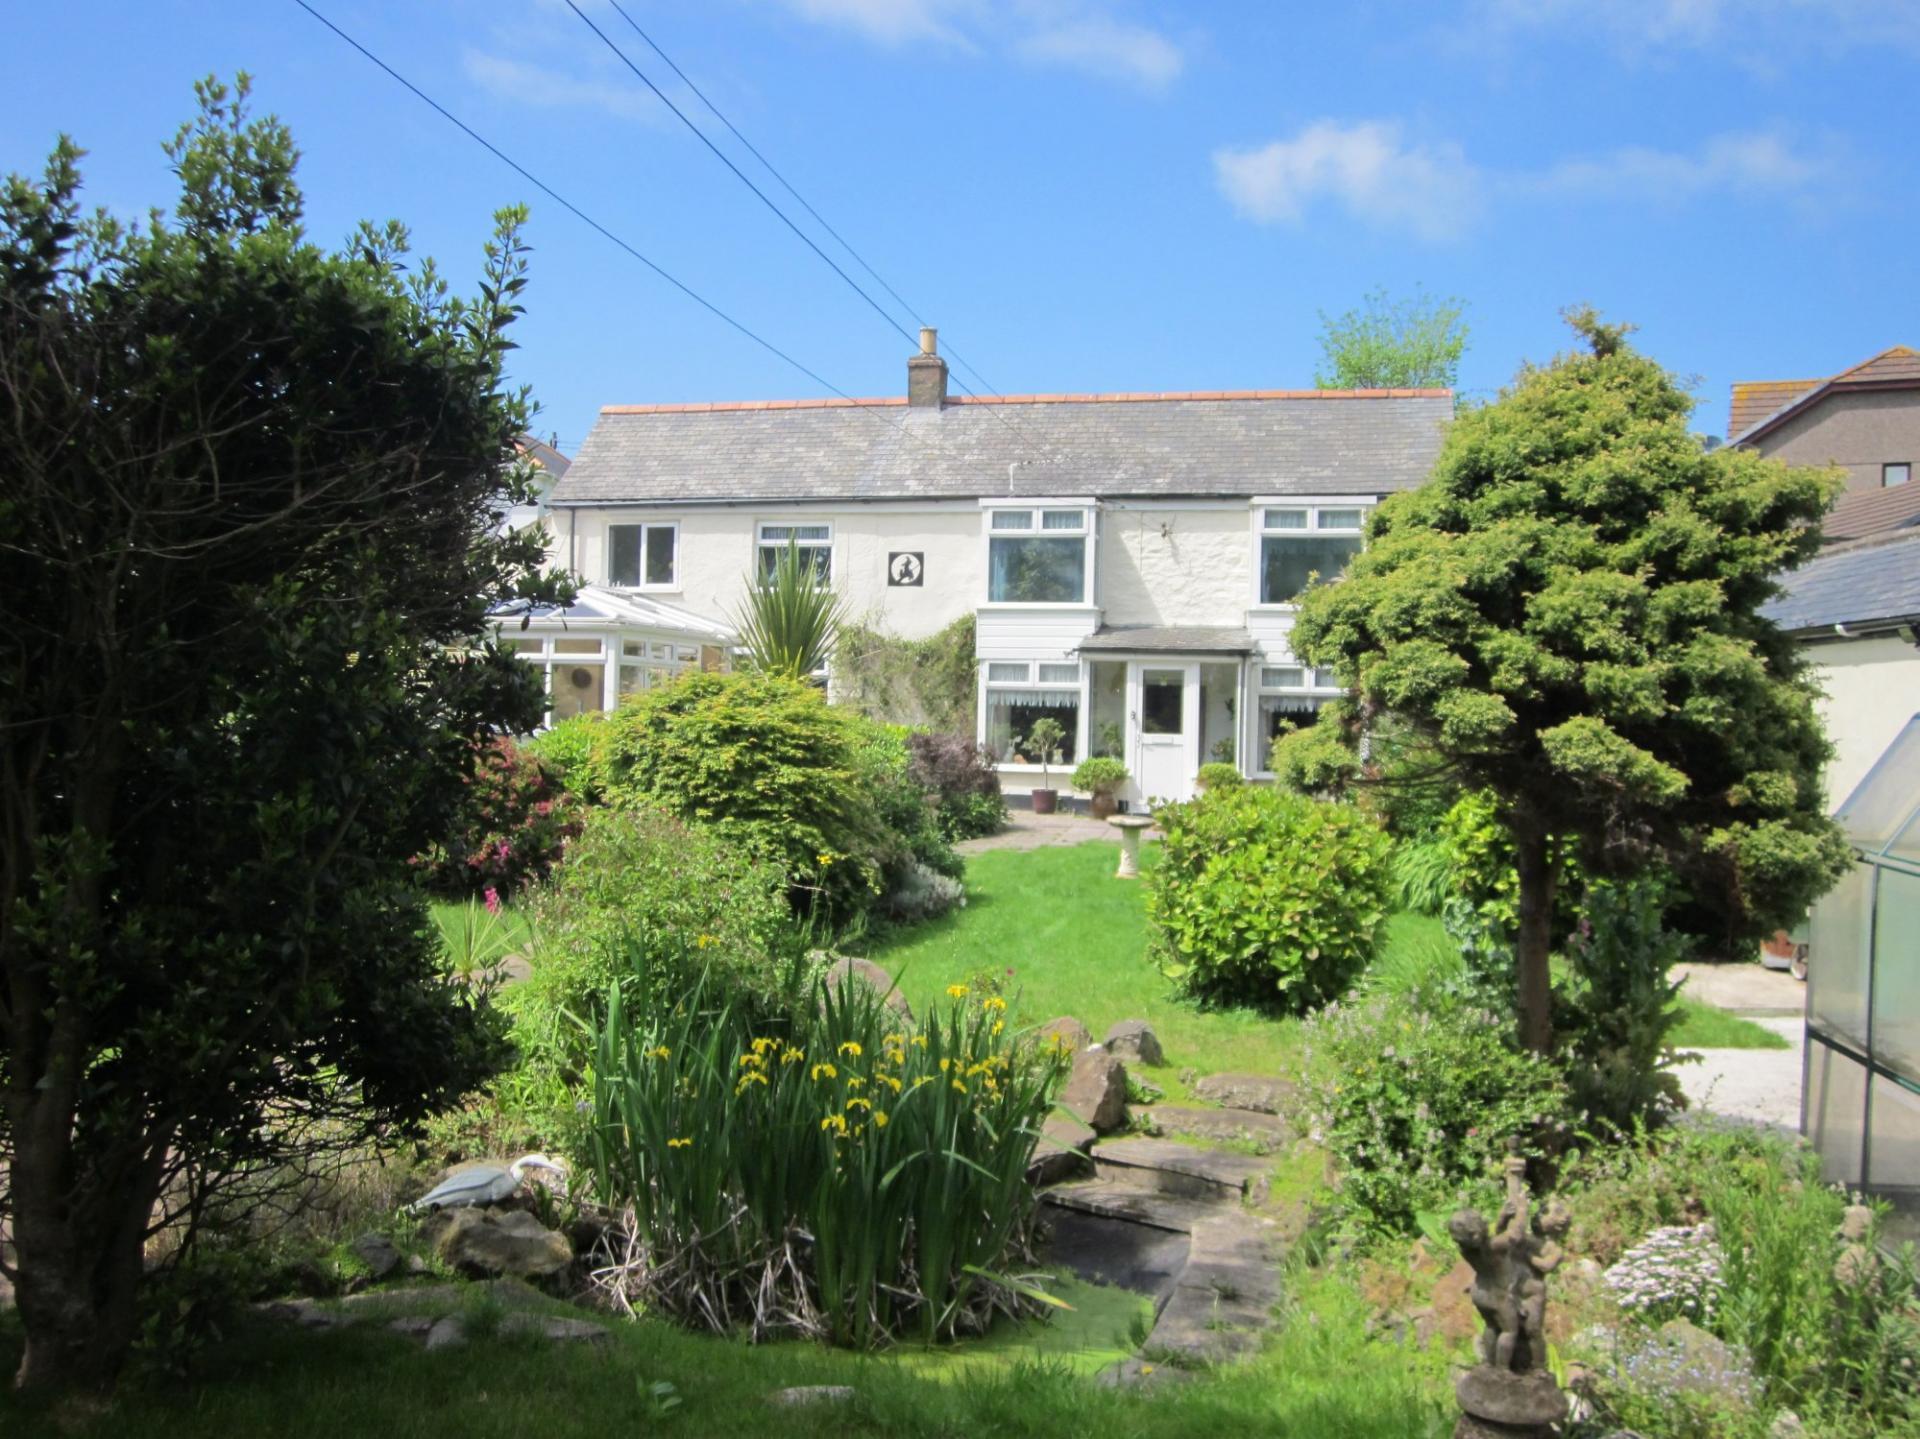 Property For Sale In Leedstown Hayle